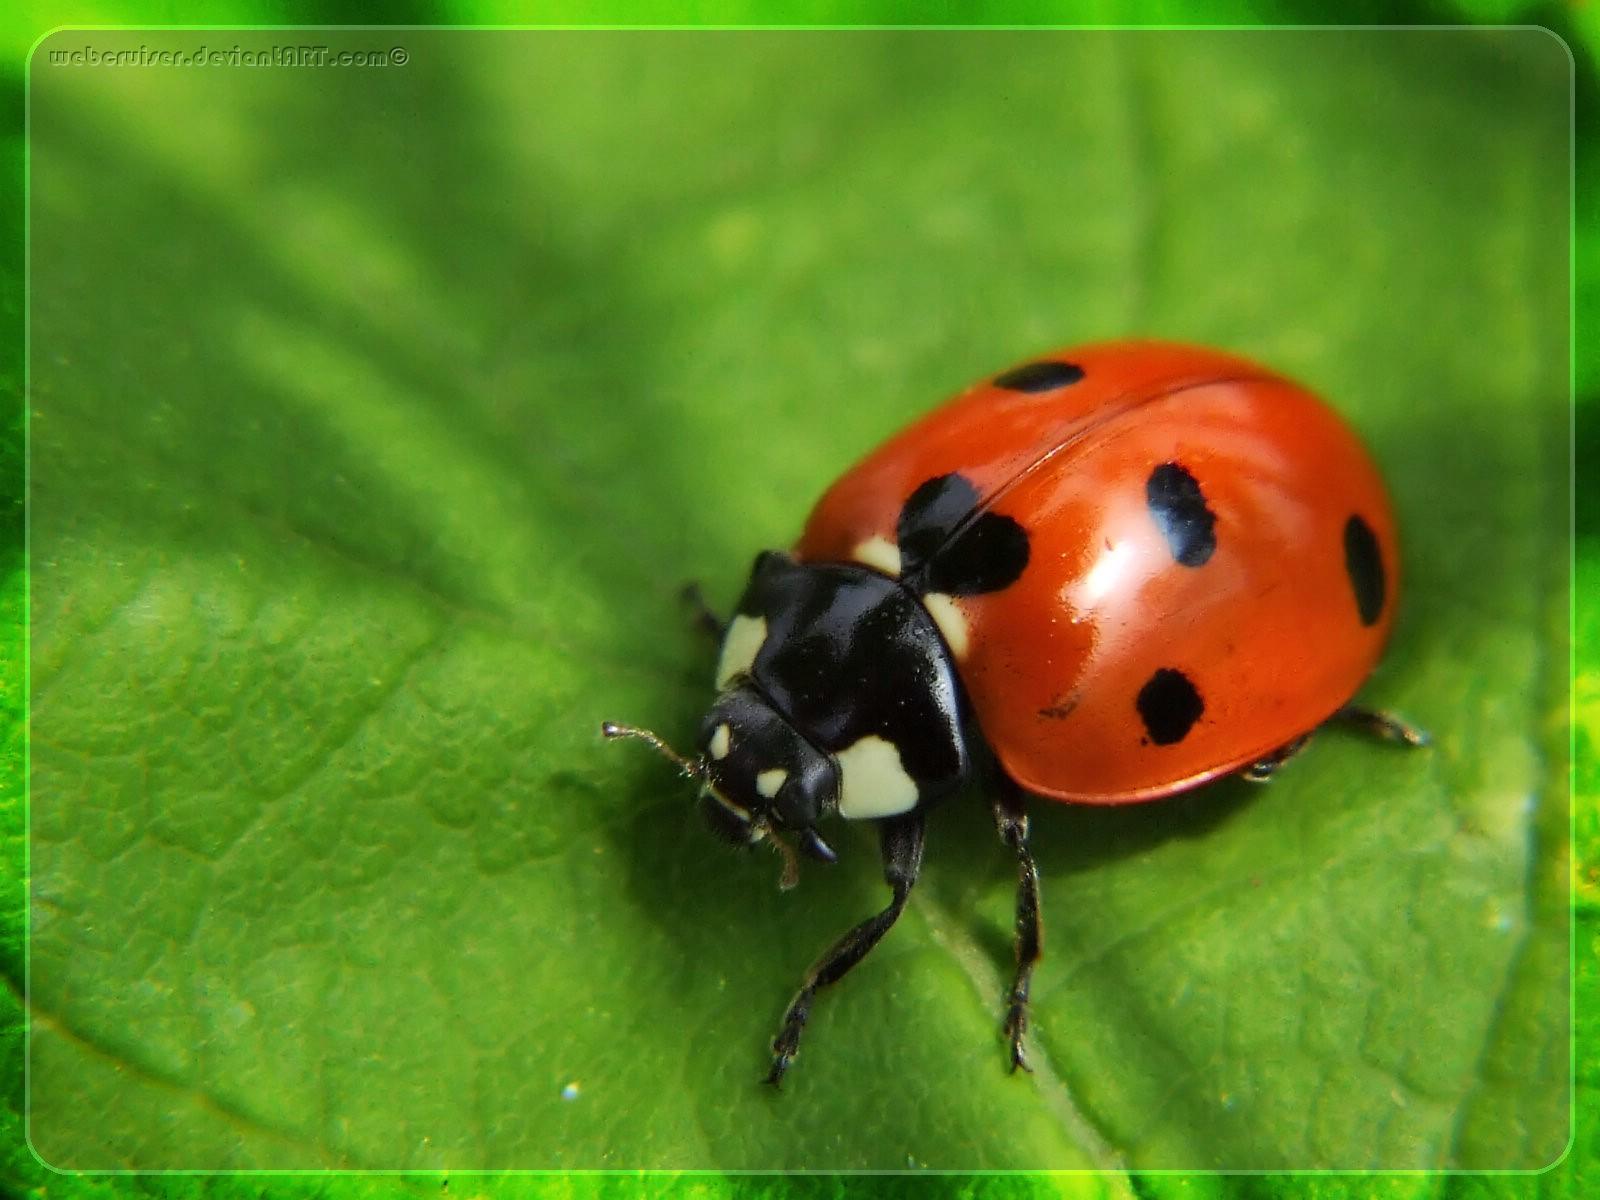 Ladybug Backgrounds, Compatible - PC, Mobile, Gadgets| 1600x1200 px